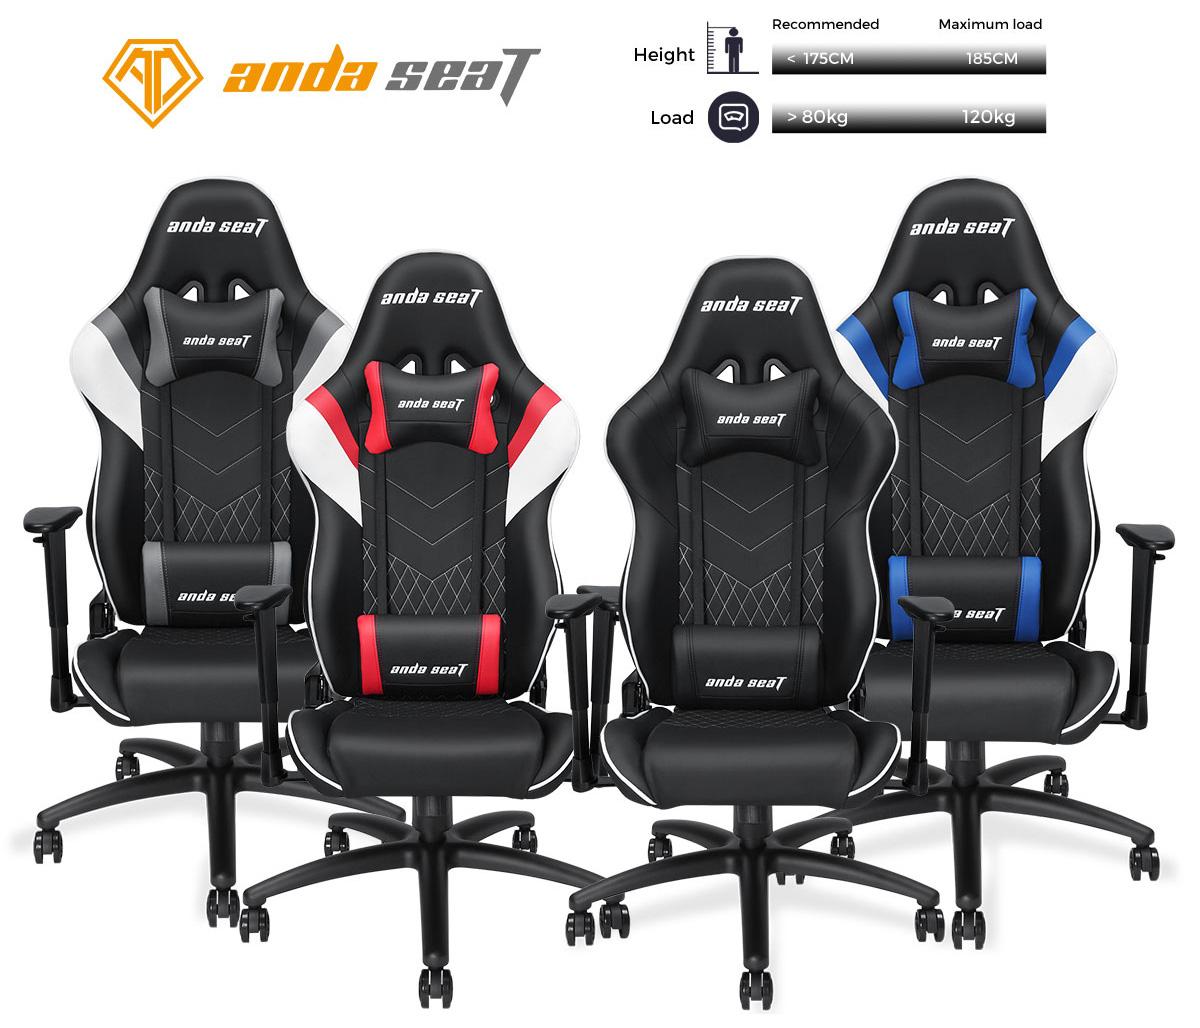 Anda Seat Assassin Series Gaming Chair Racing Bucket Office 175cm Black Plastic Handle Pcb Circuit Board Cleaning Anti Static